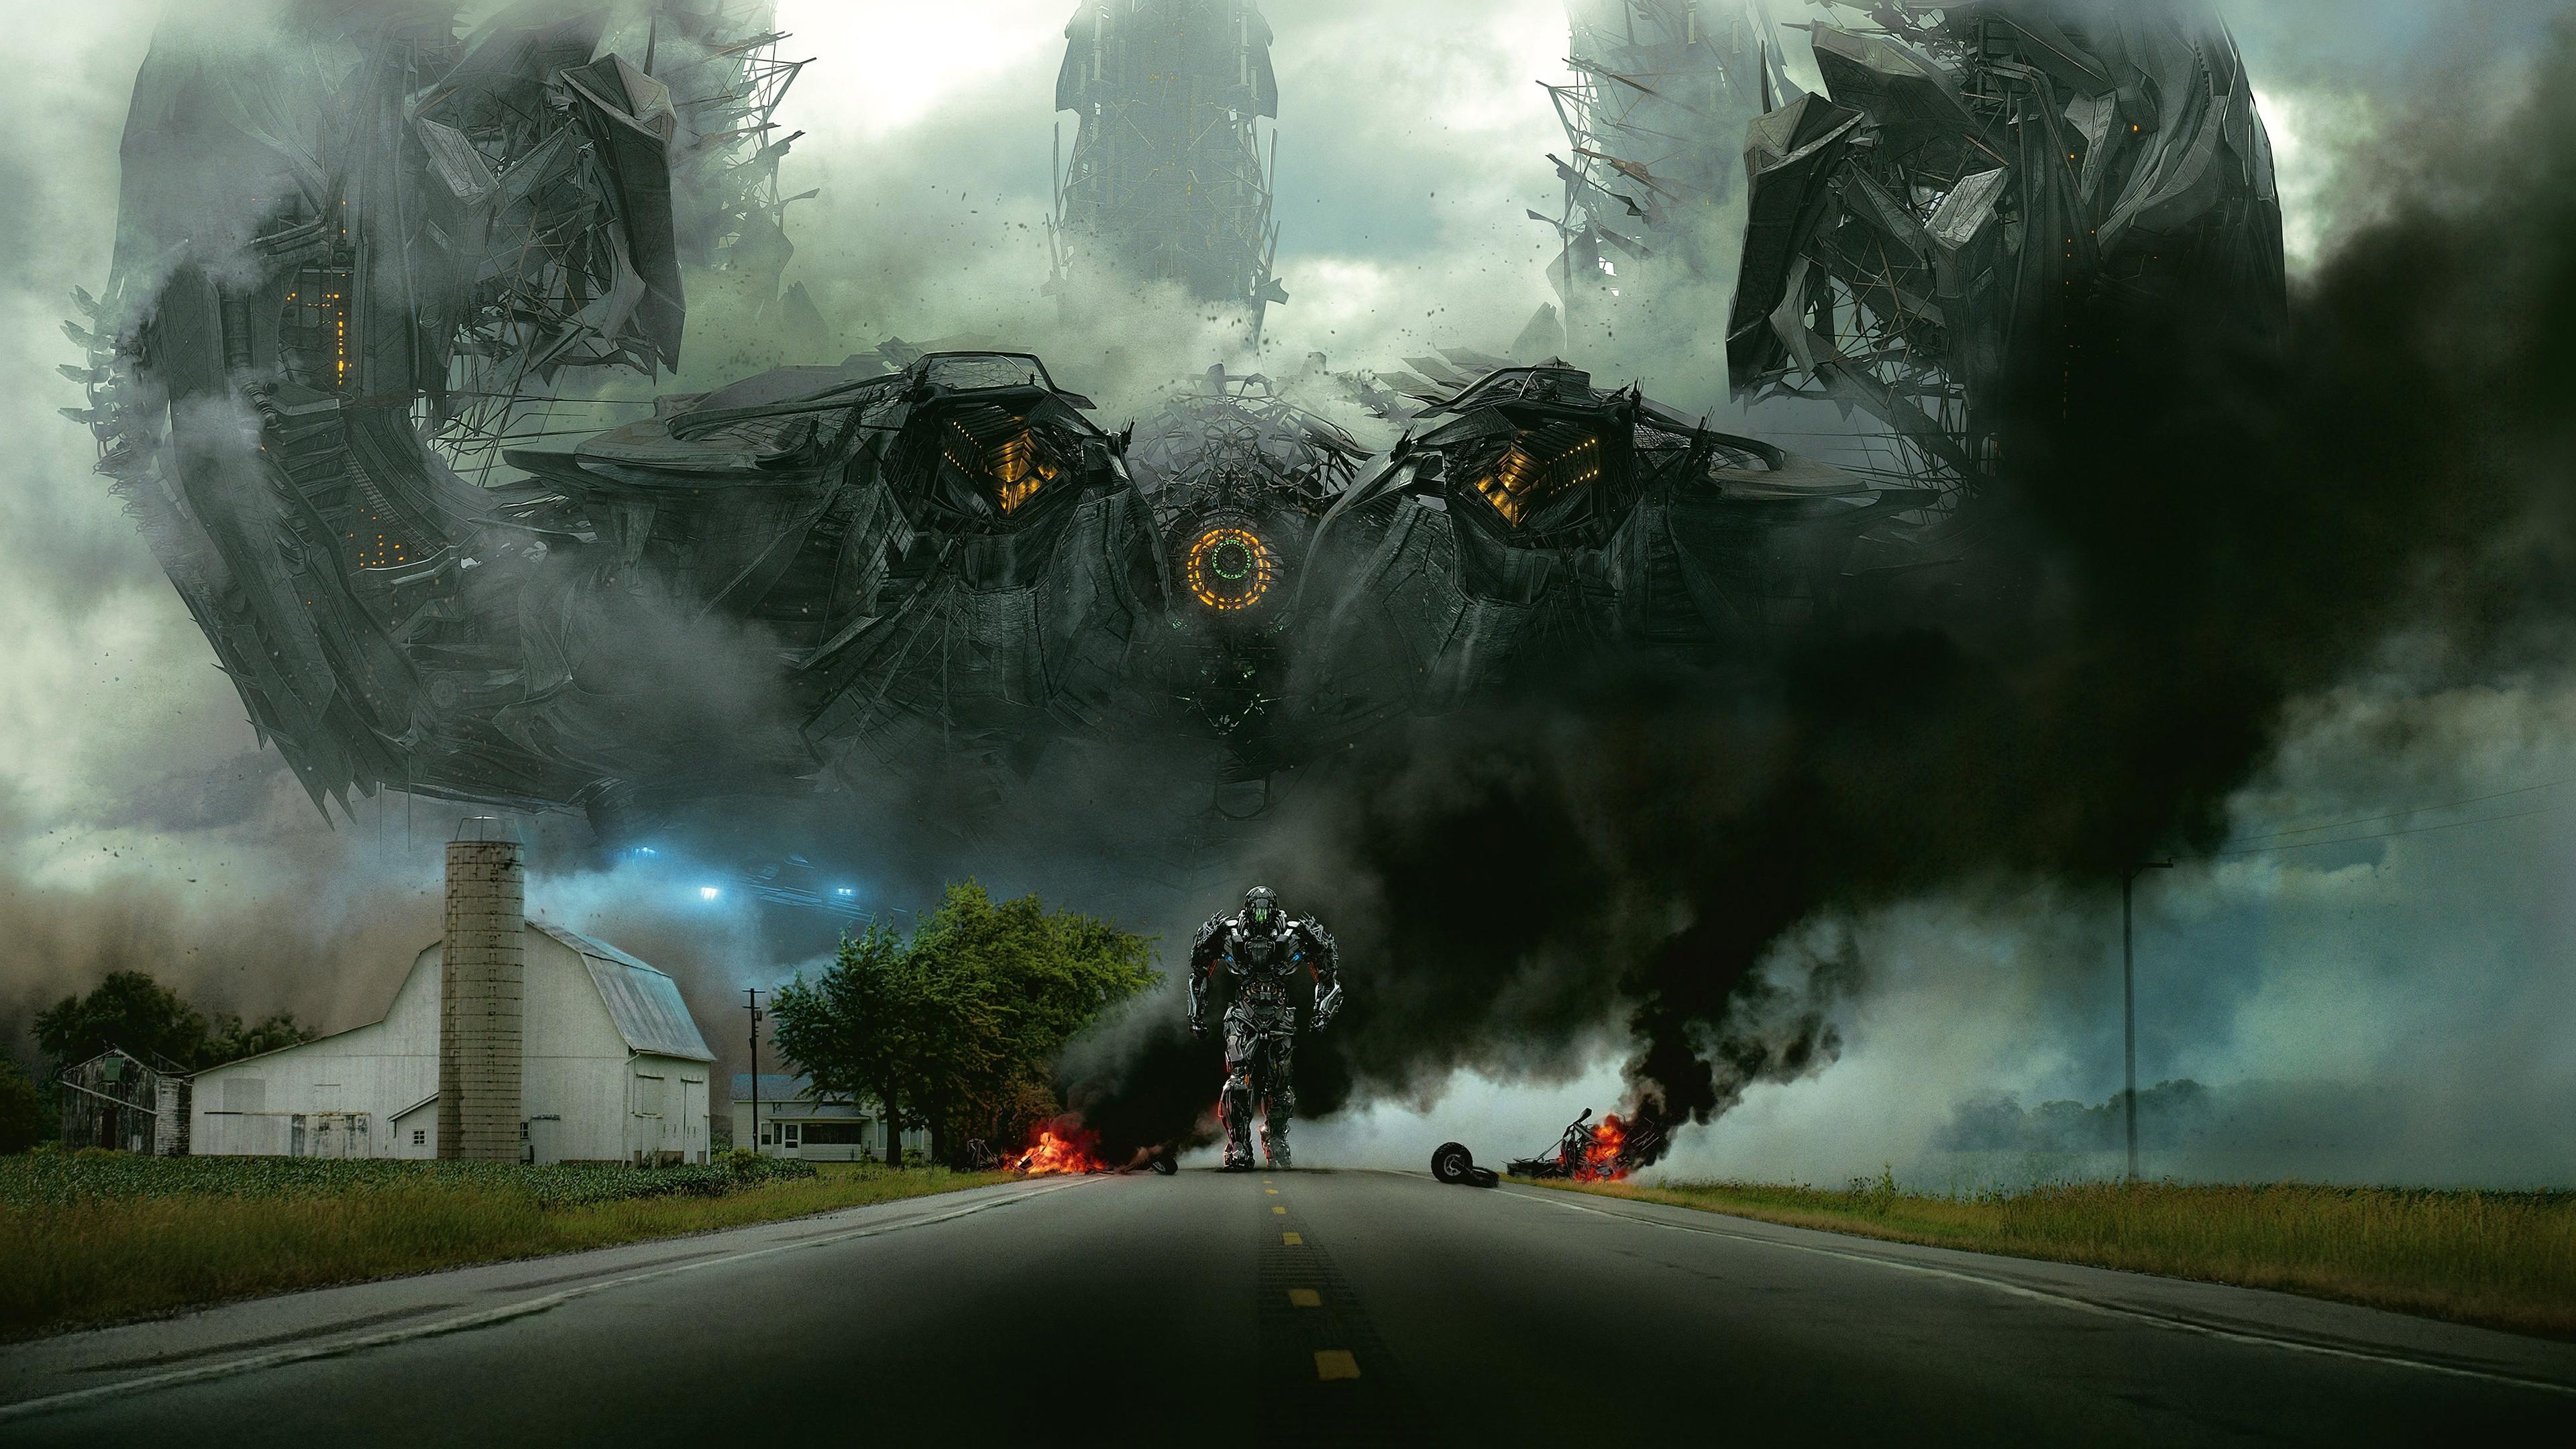 Lockdown In Transformers 4 Movie 4k Resolution Wallpaper - Transformers 4 Wallpaper 4k - HD Wallpaper